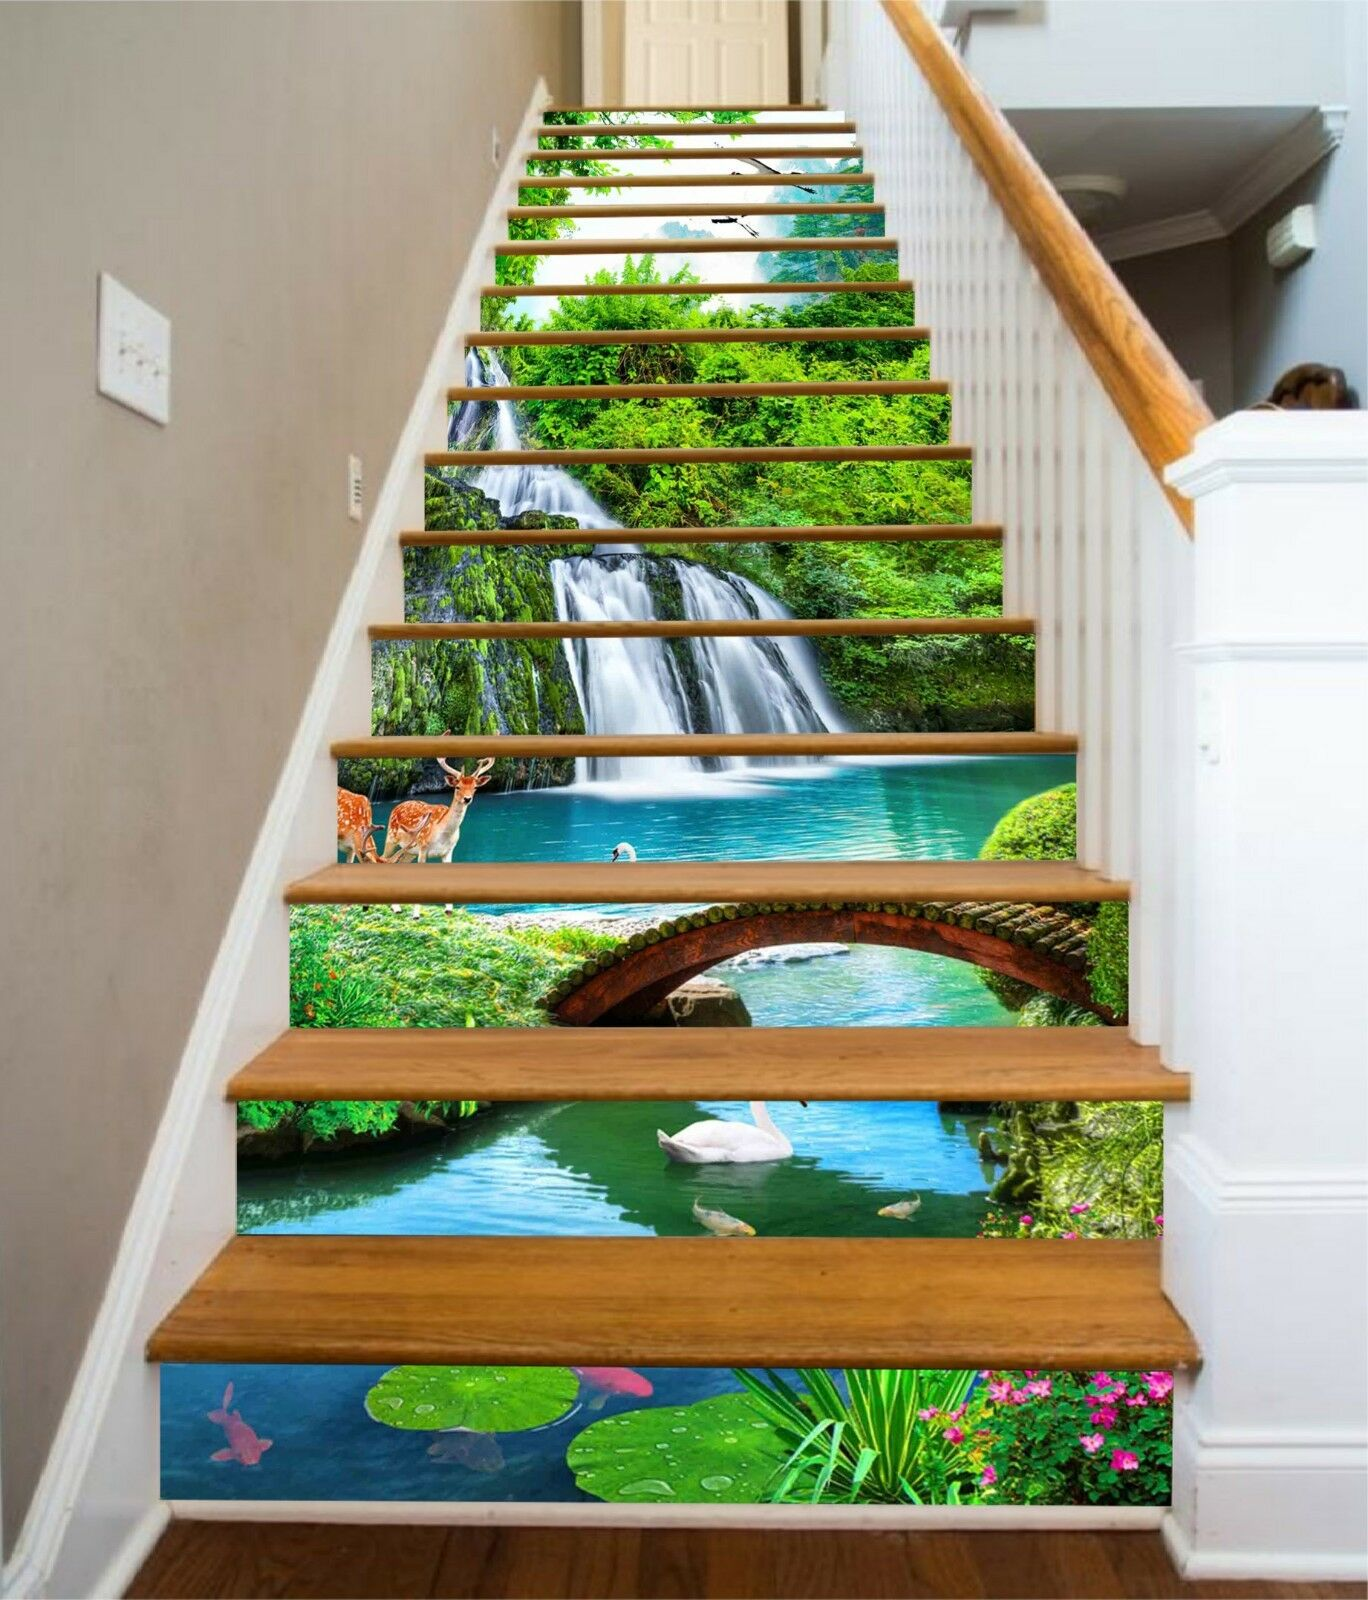 3D Waterfall Deer Stair Risers Decoration Photo Mural Vinyl Decal Wallpaper CA